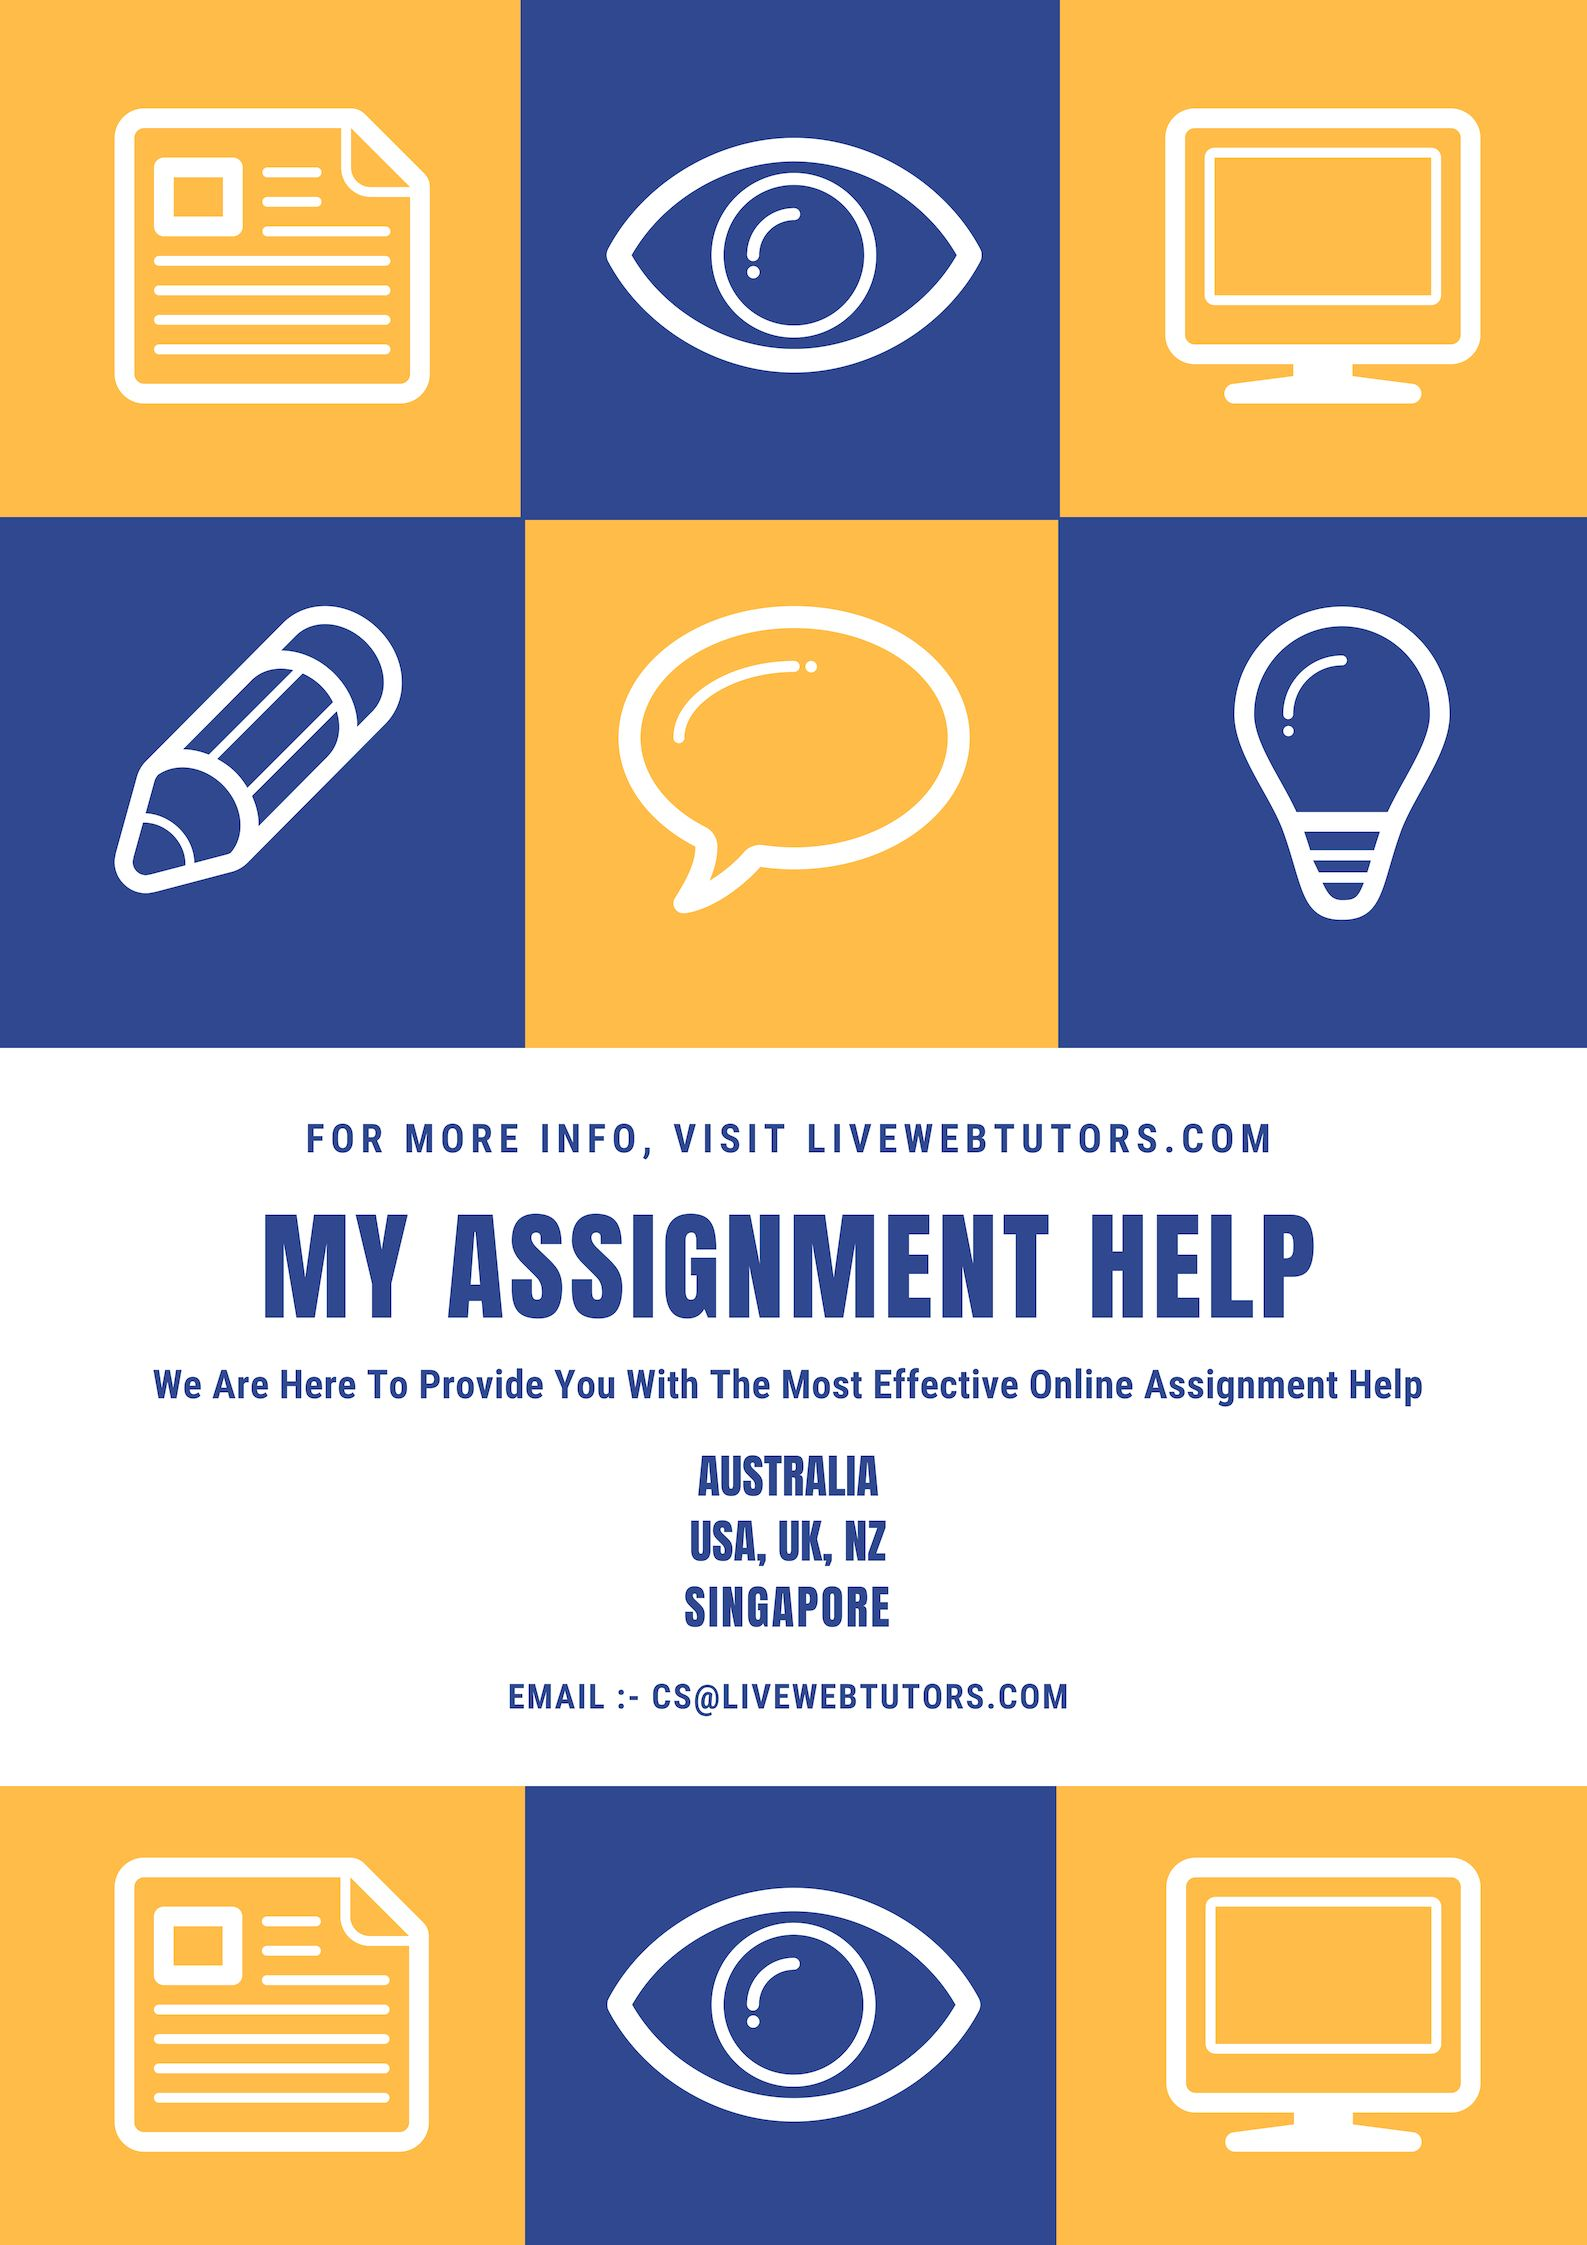 Assignment help - essay help singapore